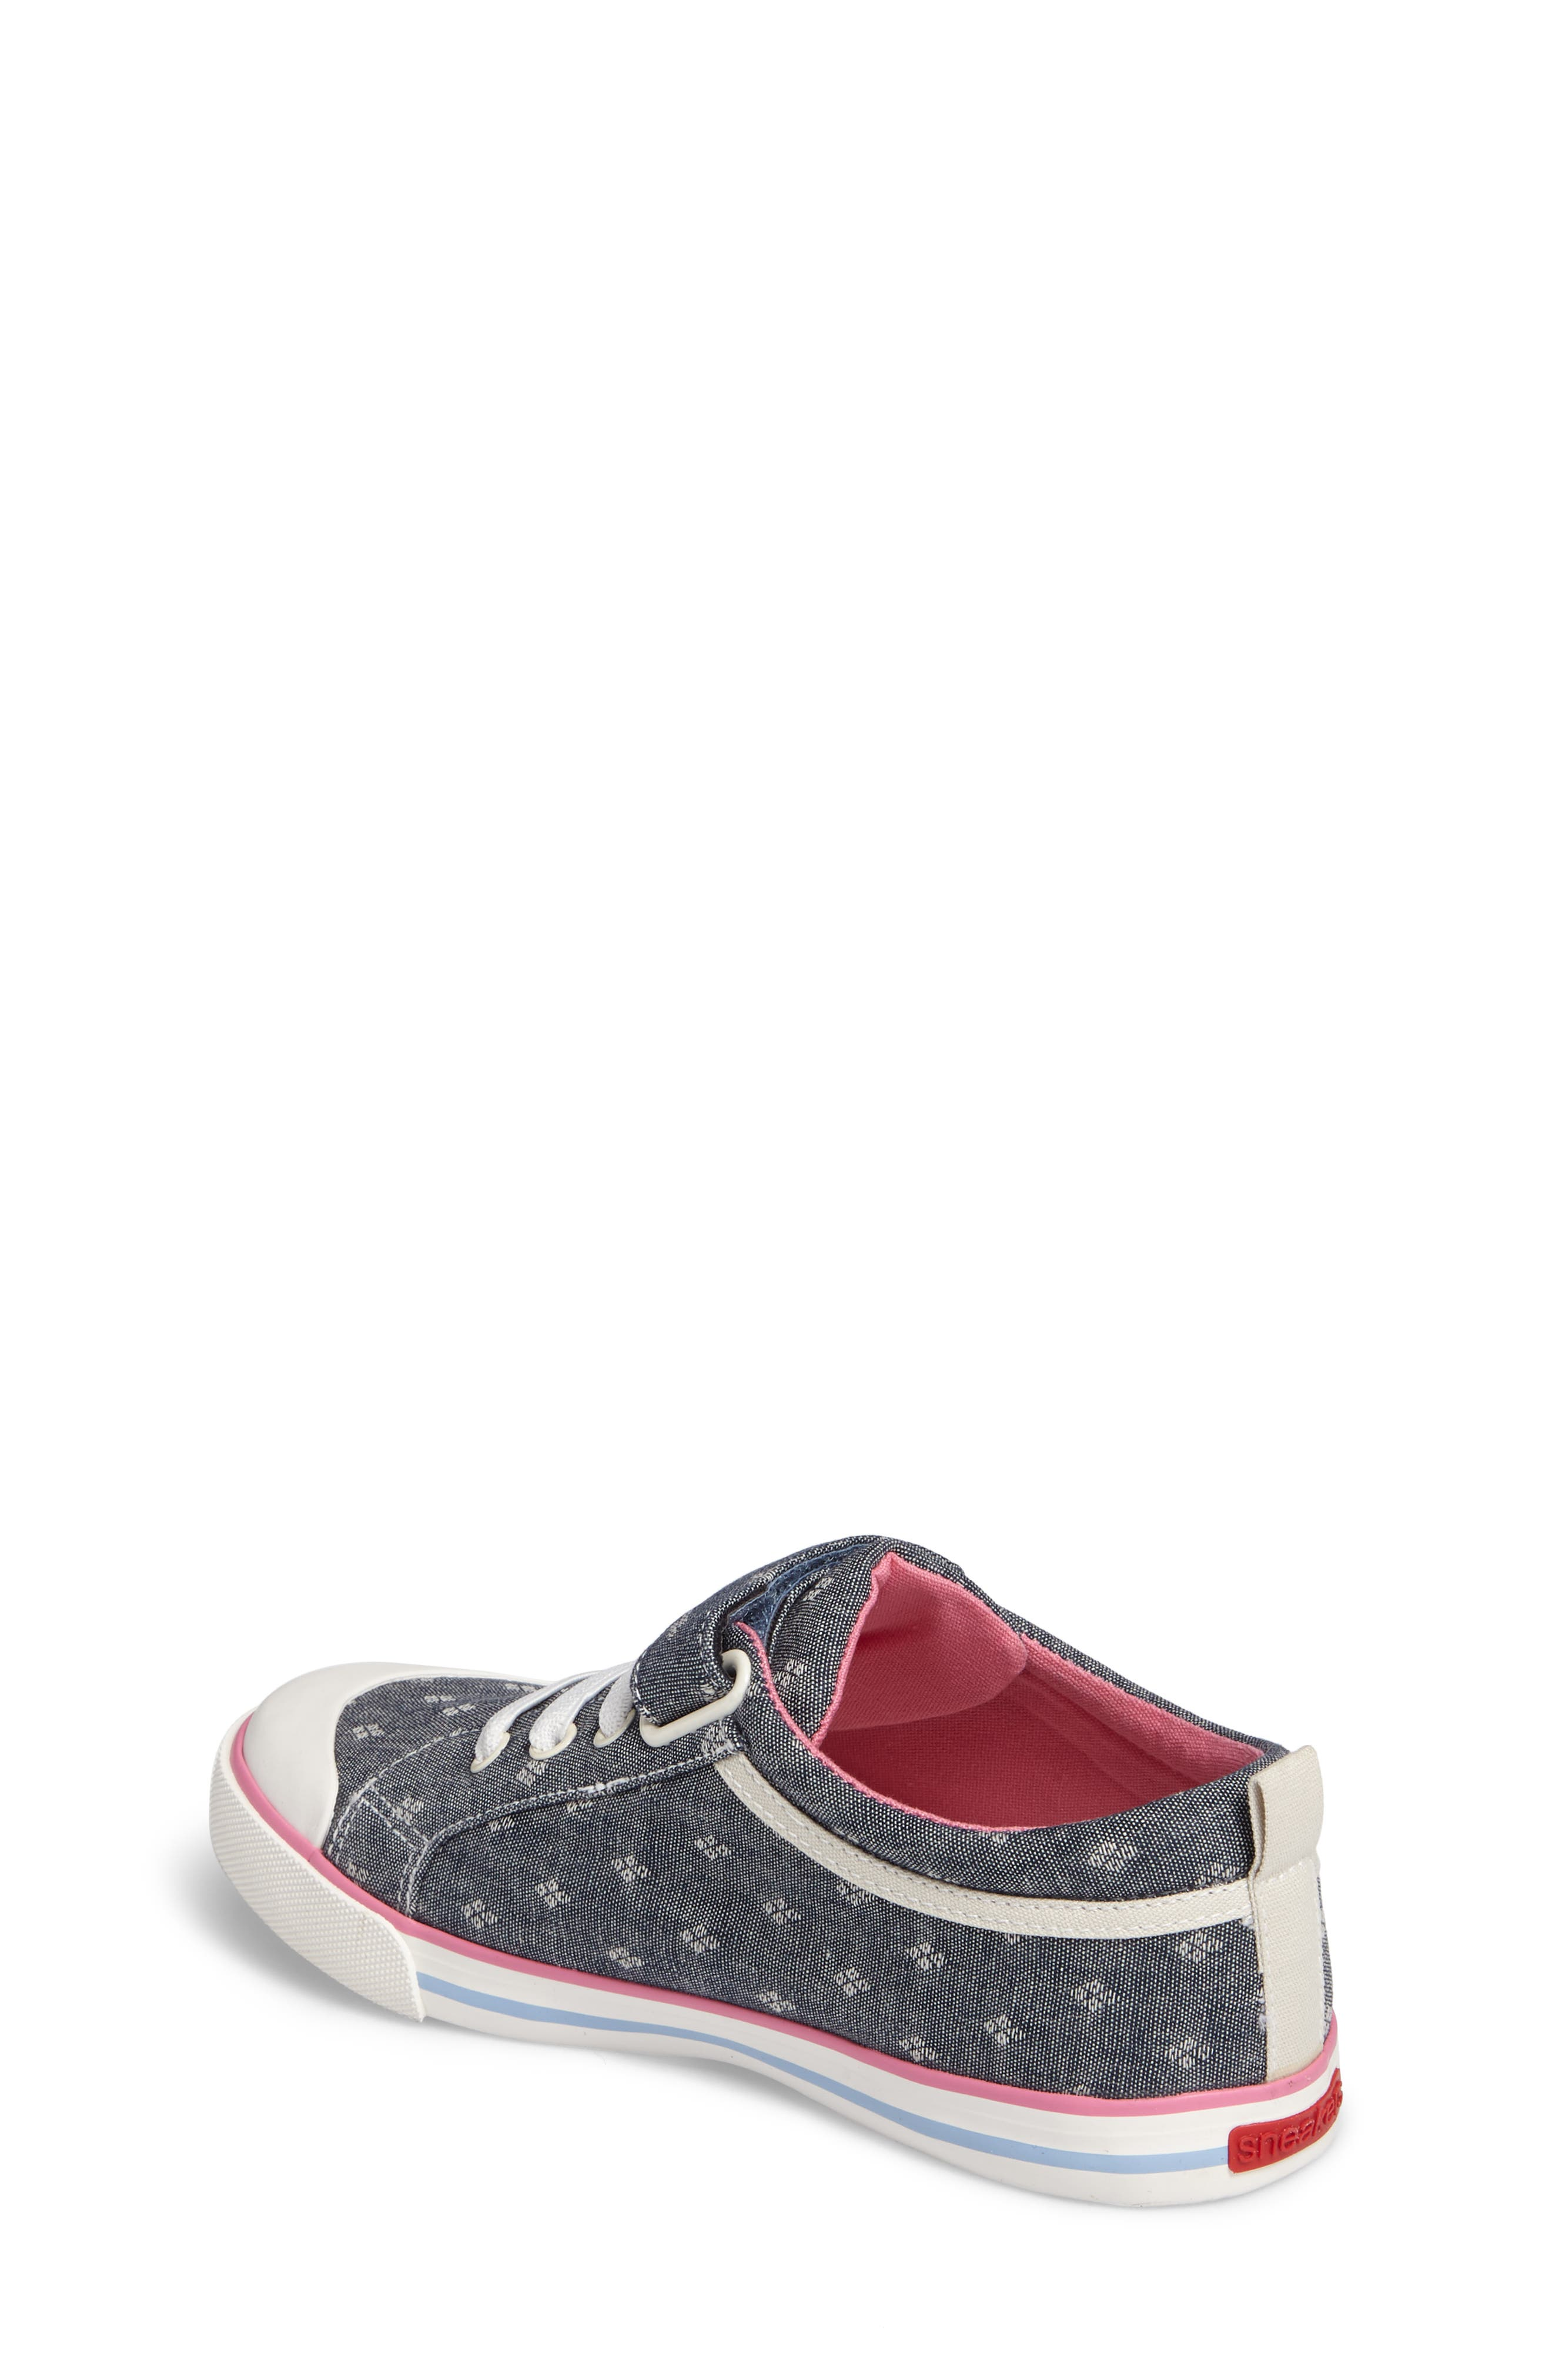 'Kristin' Sneaker,                             Alternate thumbnail 2, color,                             400